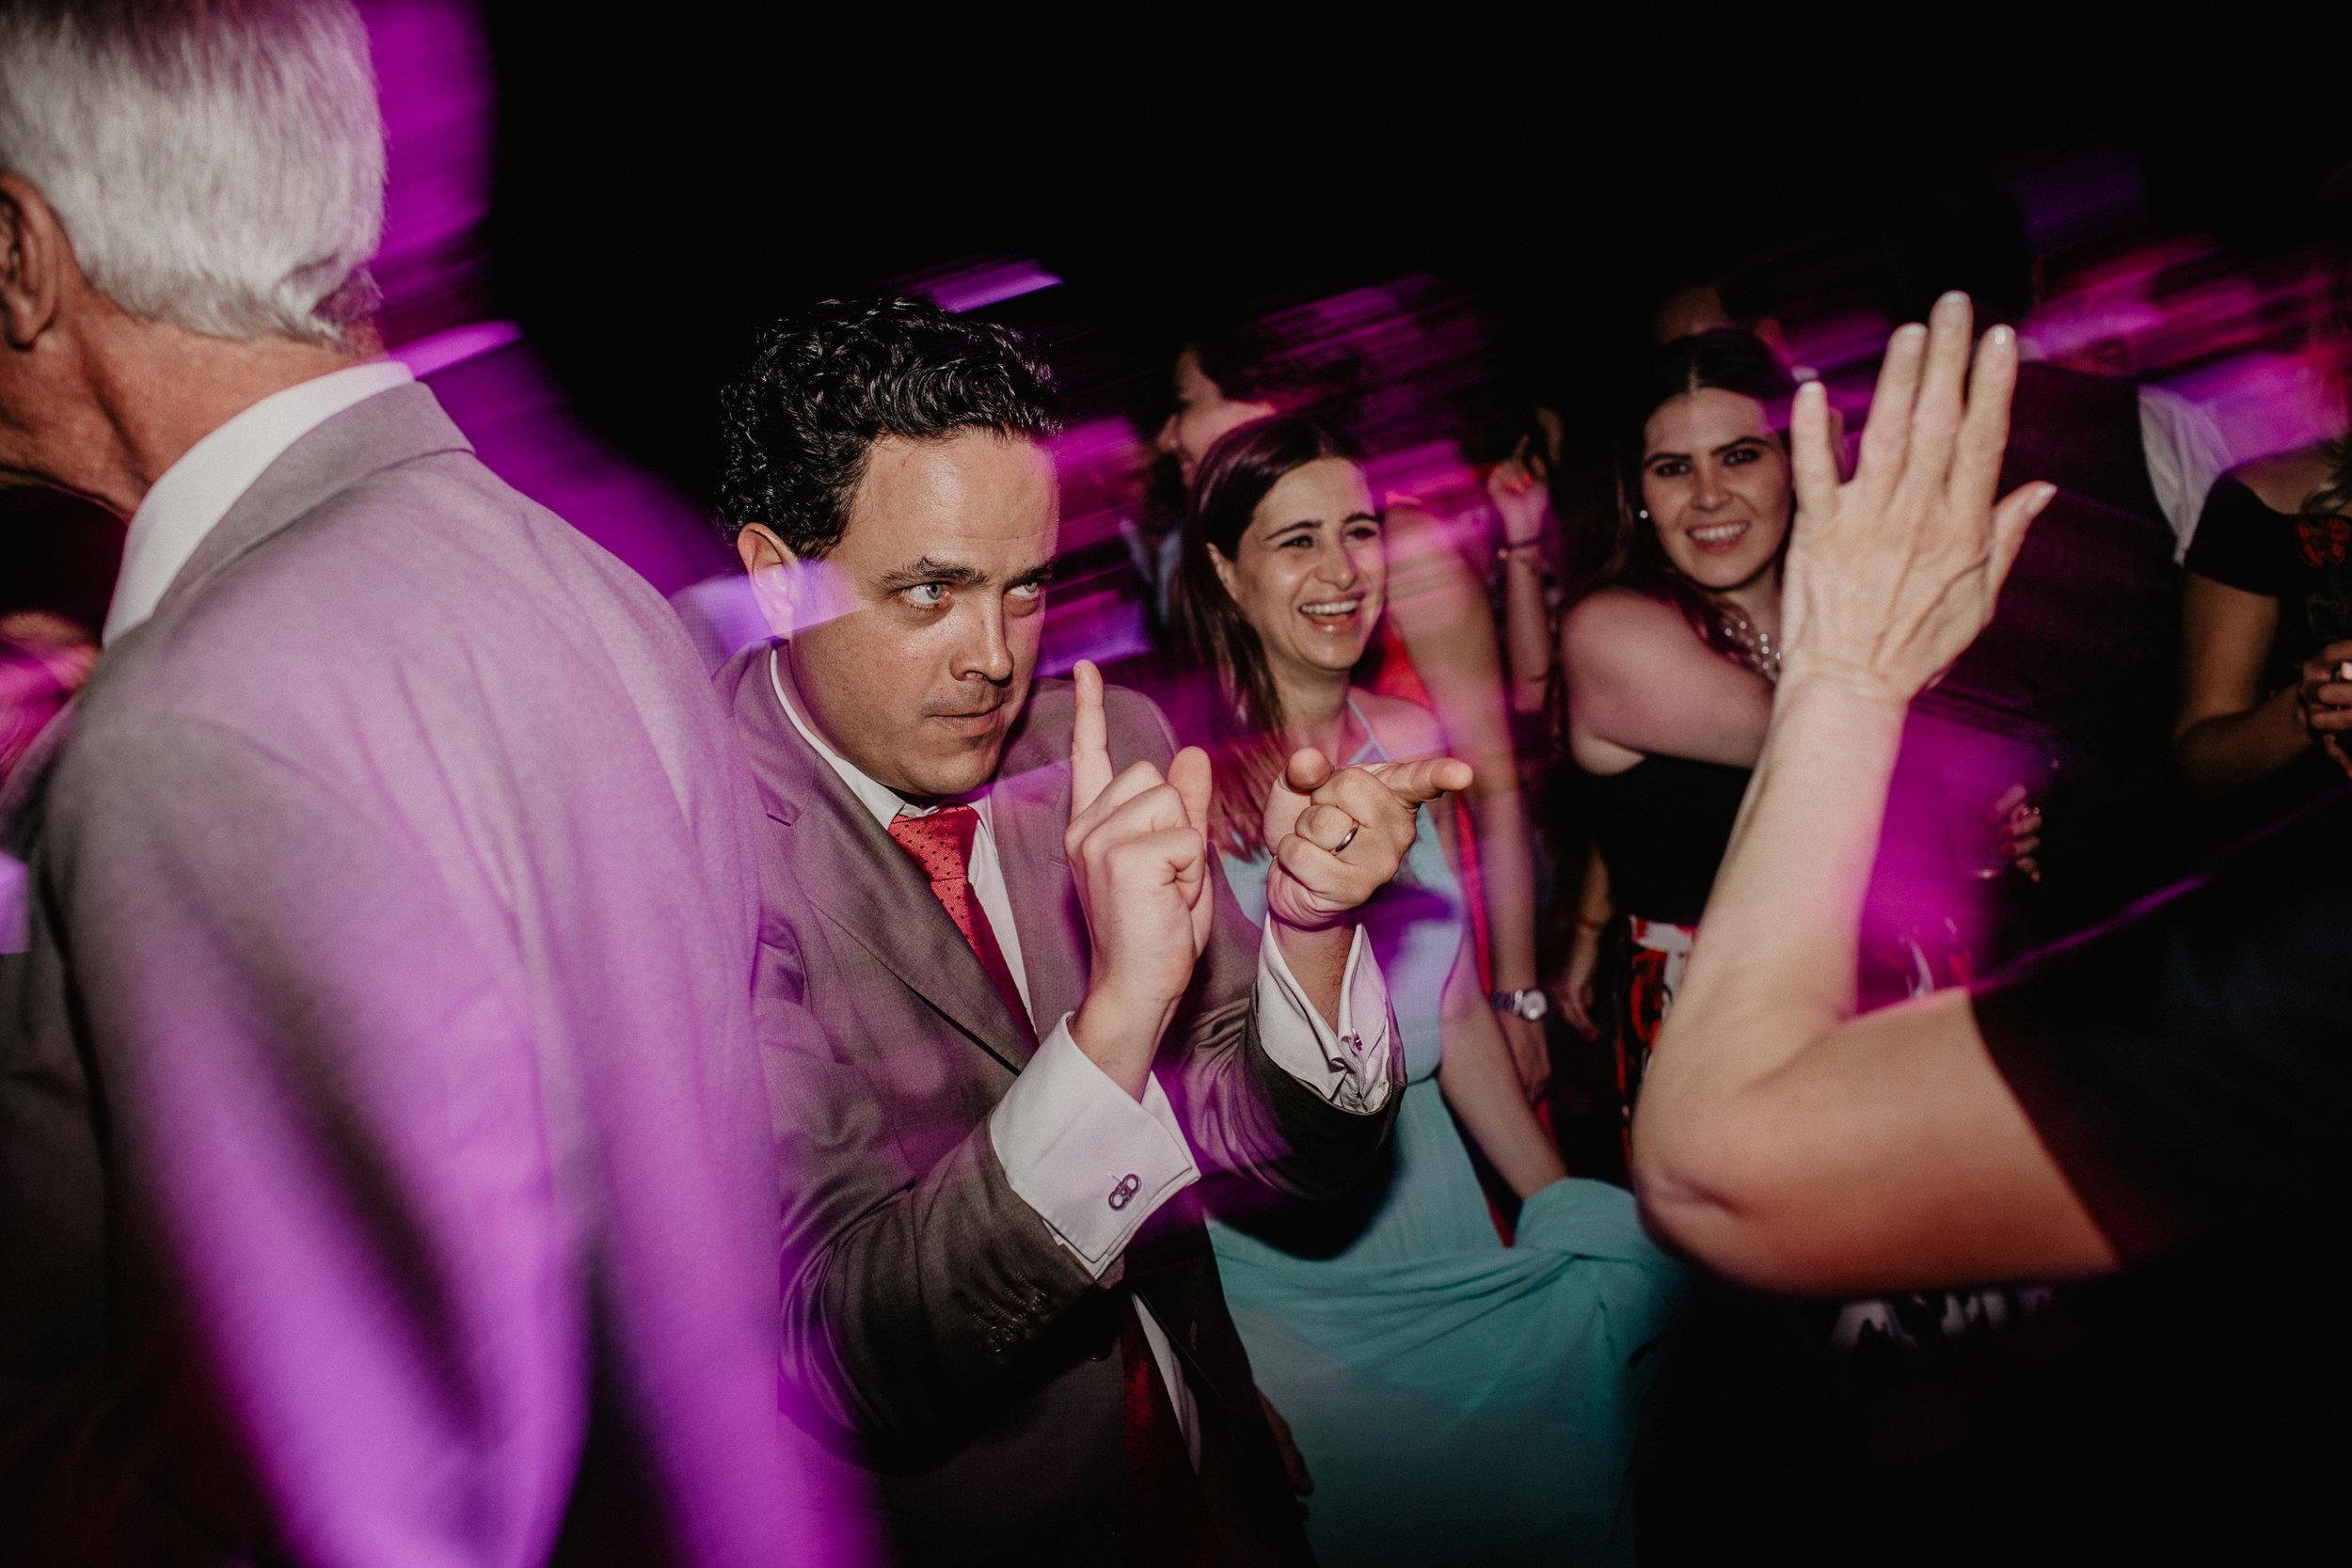 alfonso_flores_destination_wedding_photographer_pau_alonso_1275.JPG